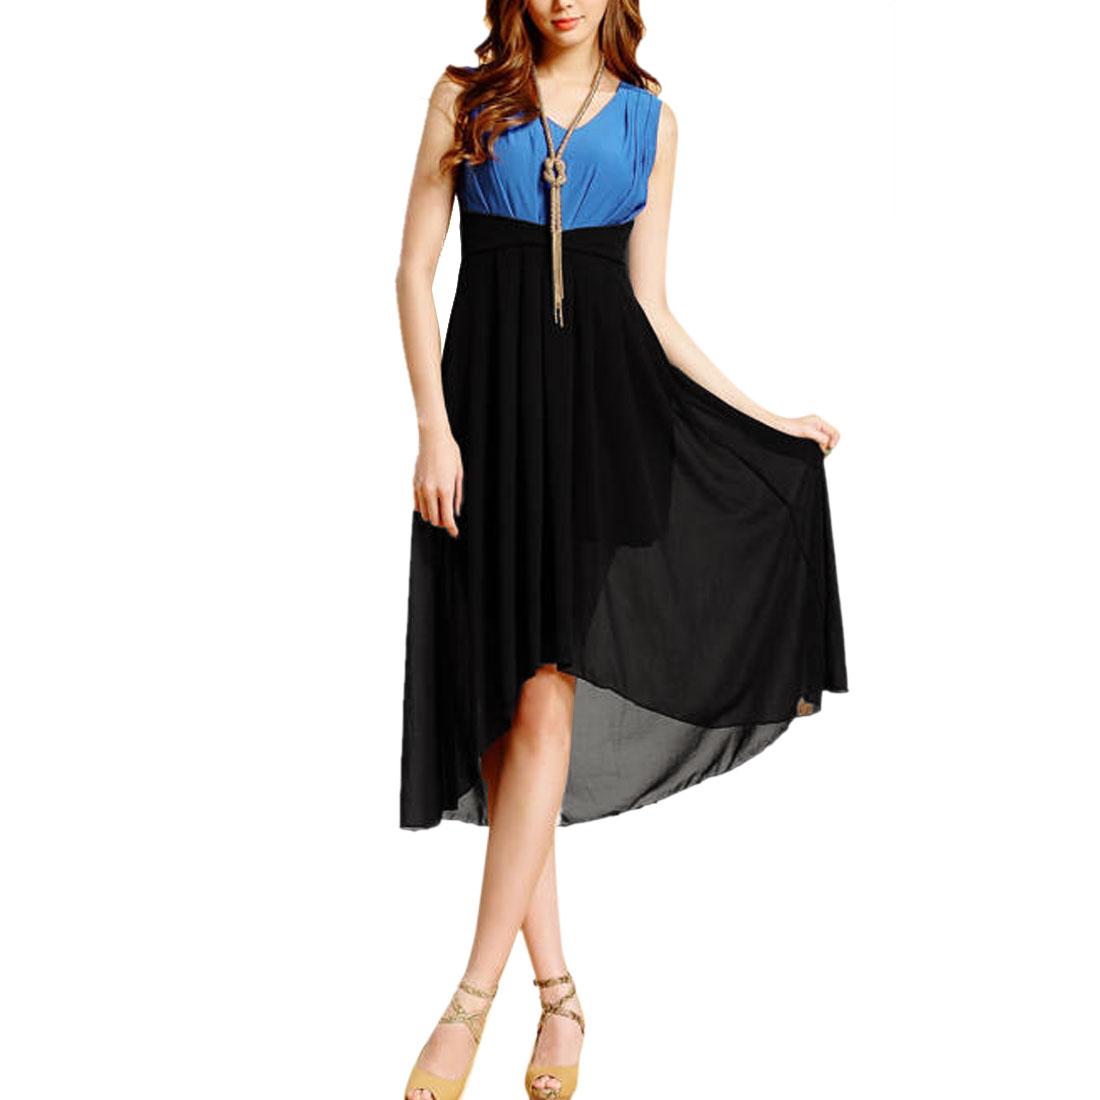 Ladies V Neck Sleeveless Low High Casual Dress Royal Blue Black XS